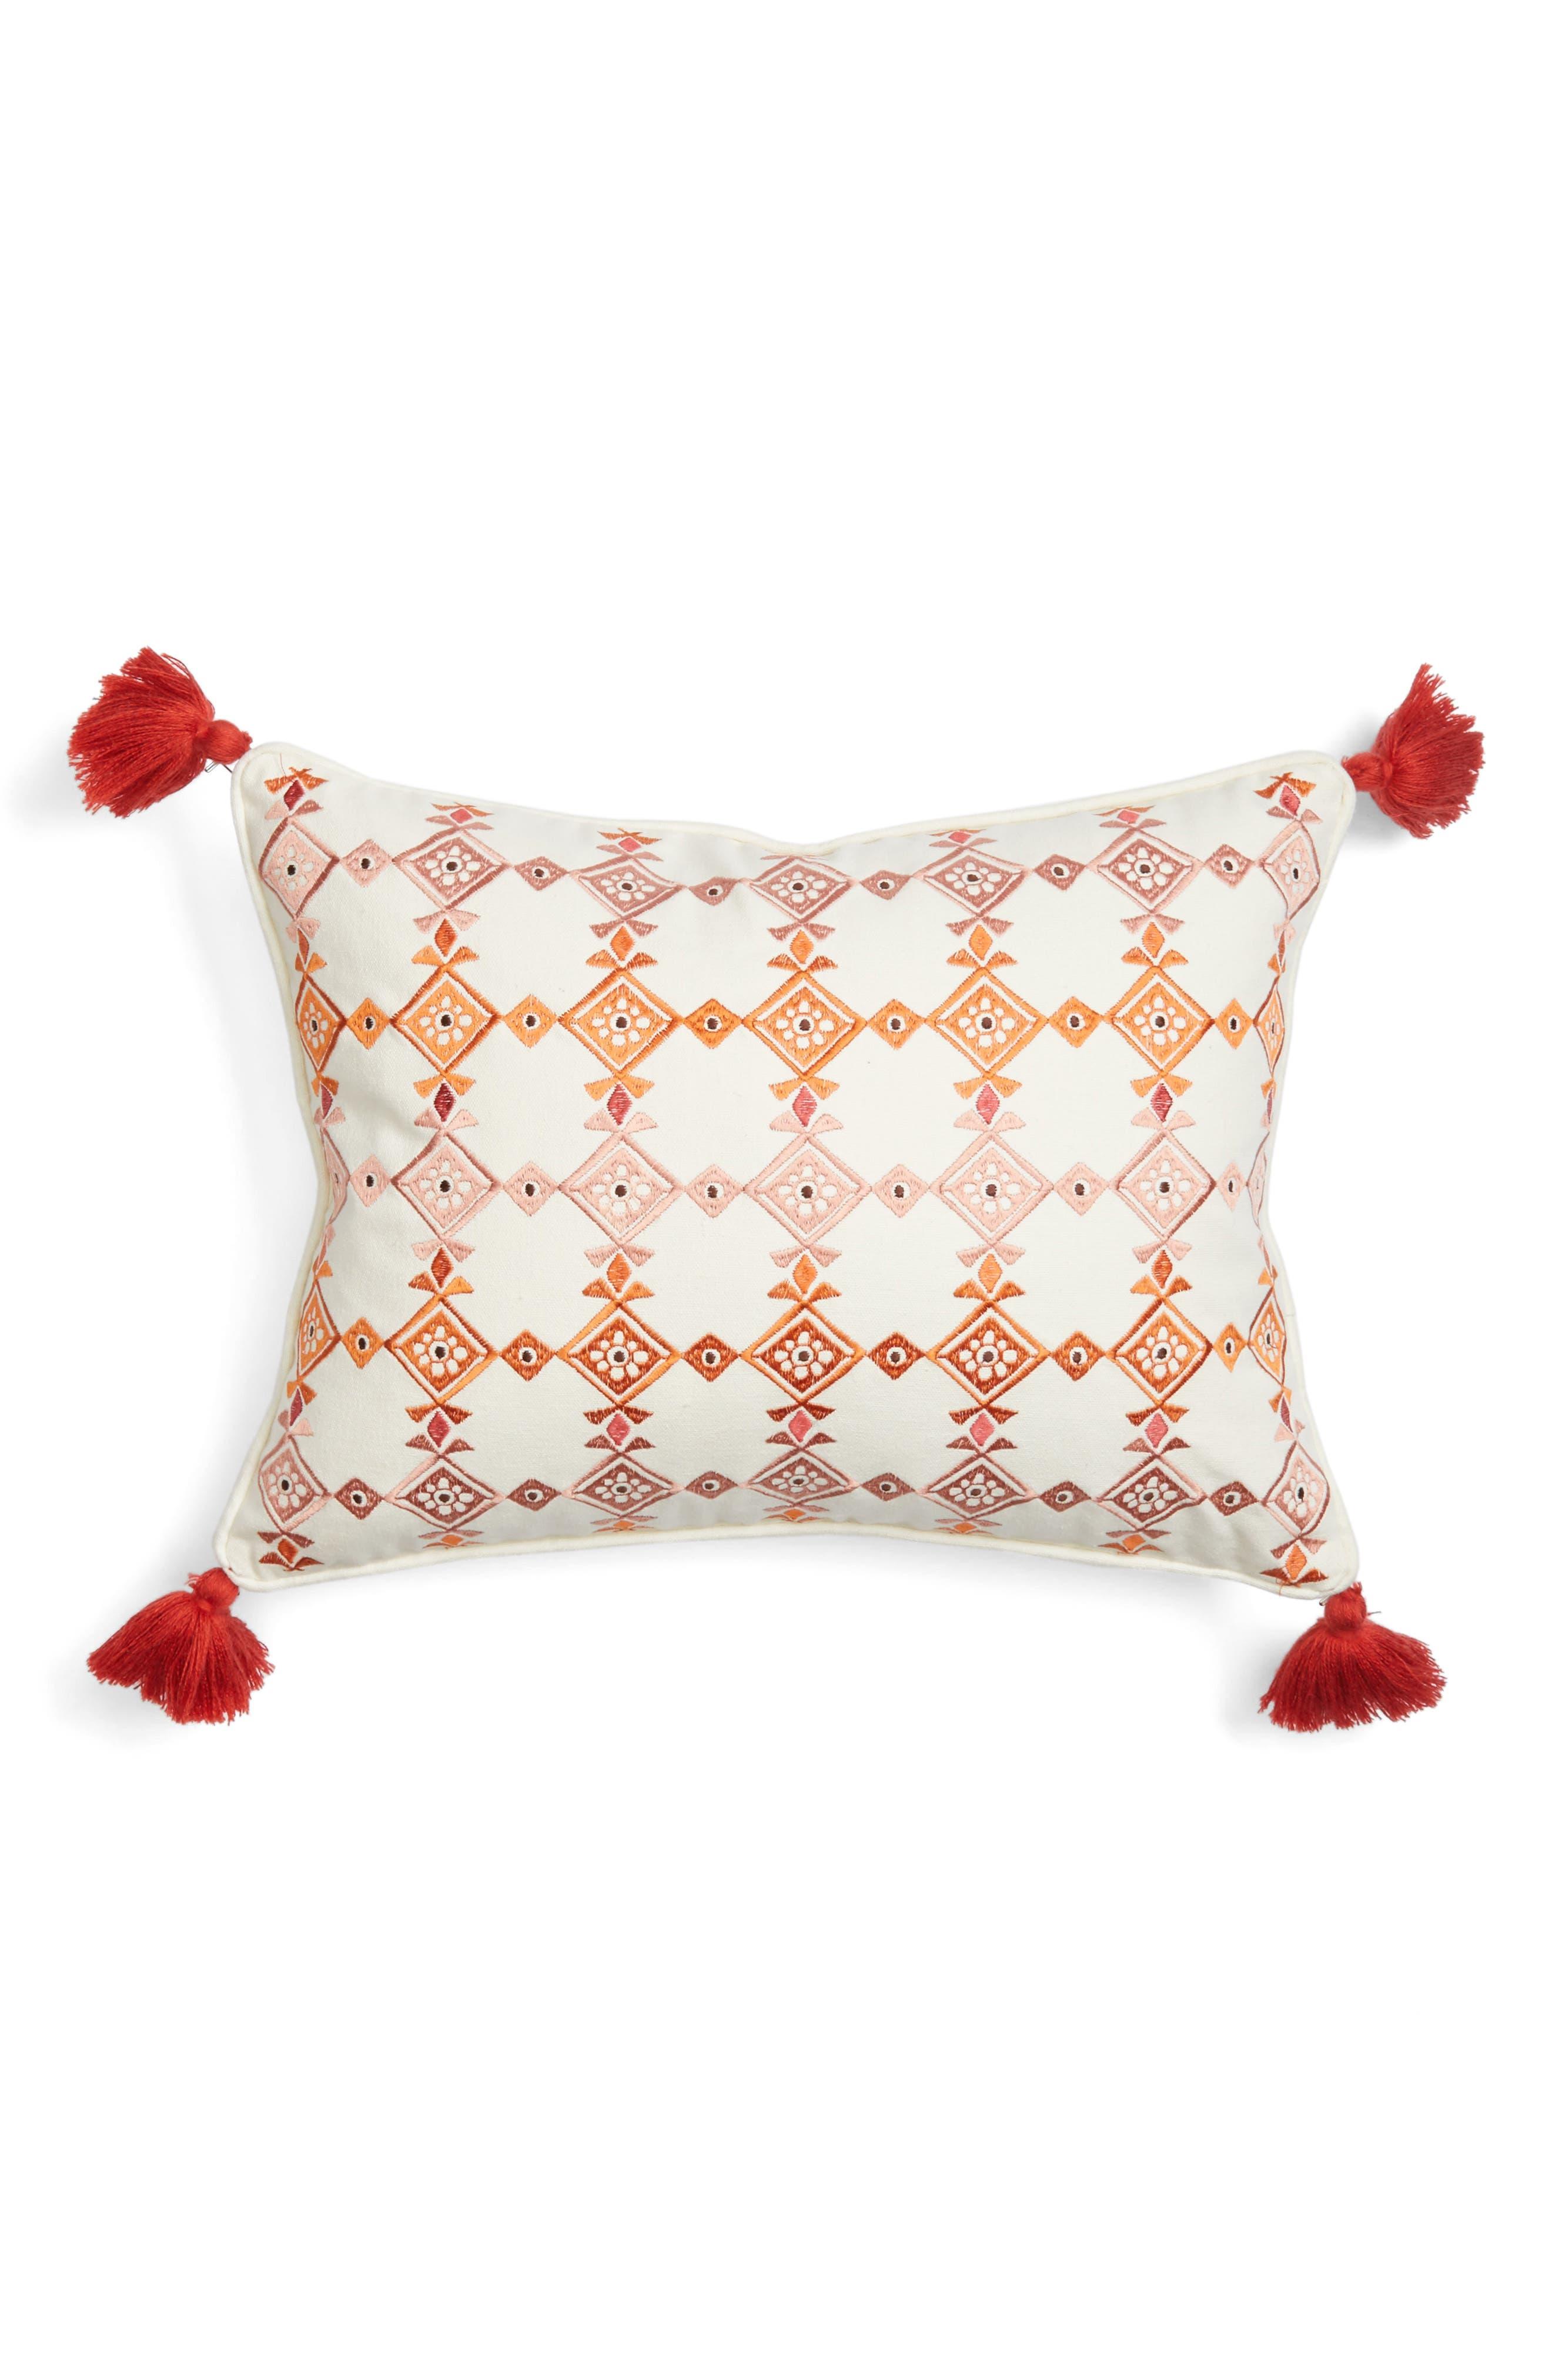 Main Image - Levtex Piper Tassel Pillow